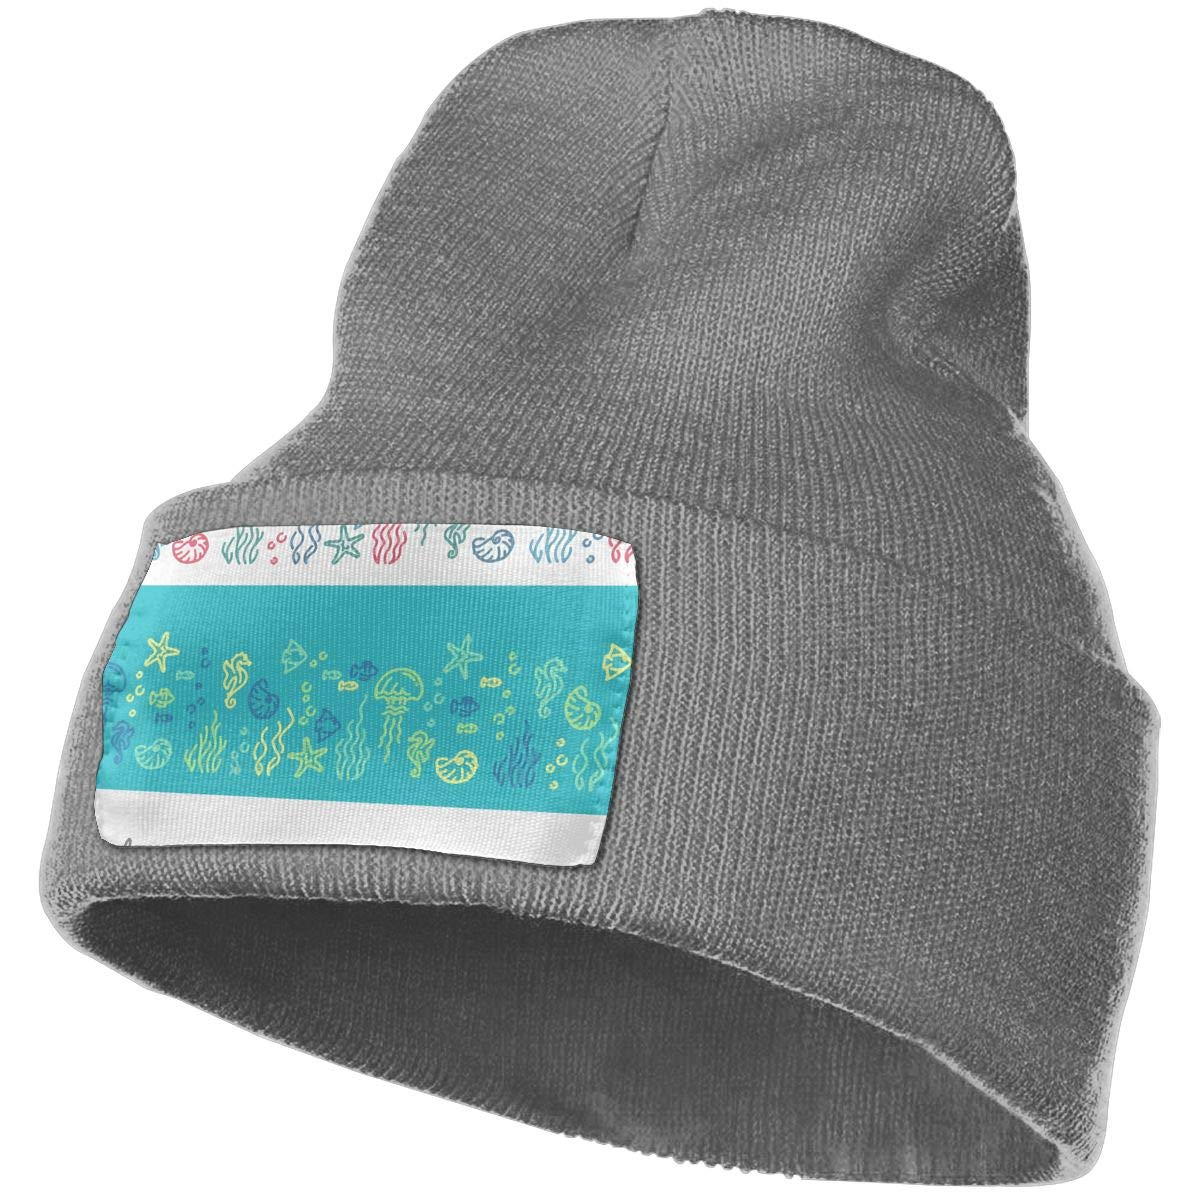 TAOMAP89 Line Marine Life Men /& Women Skull Caps Winter Warm Stretchy Knit Beanie Hats